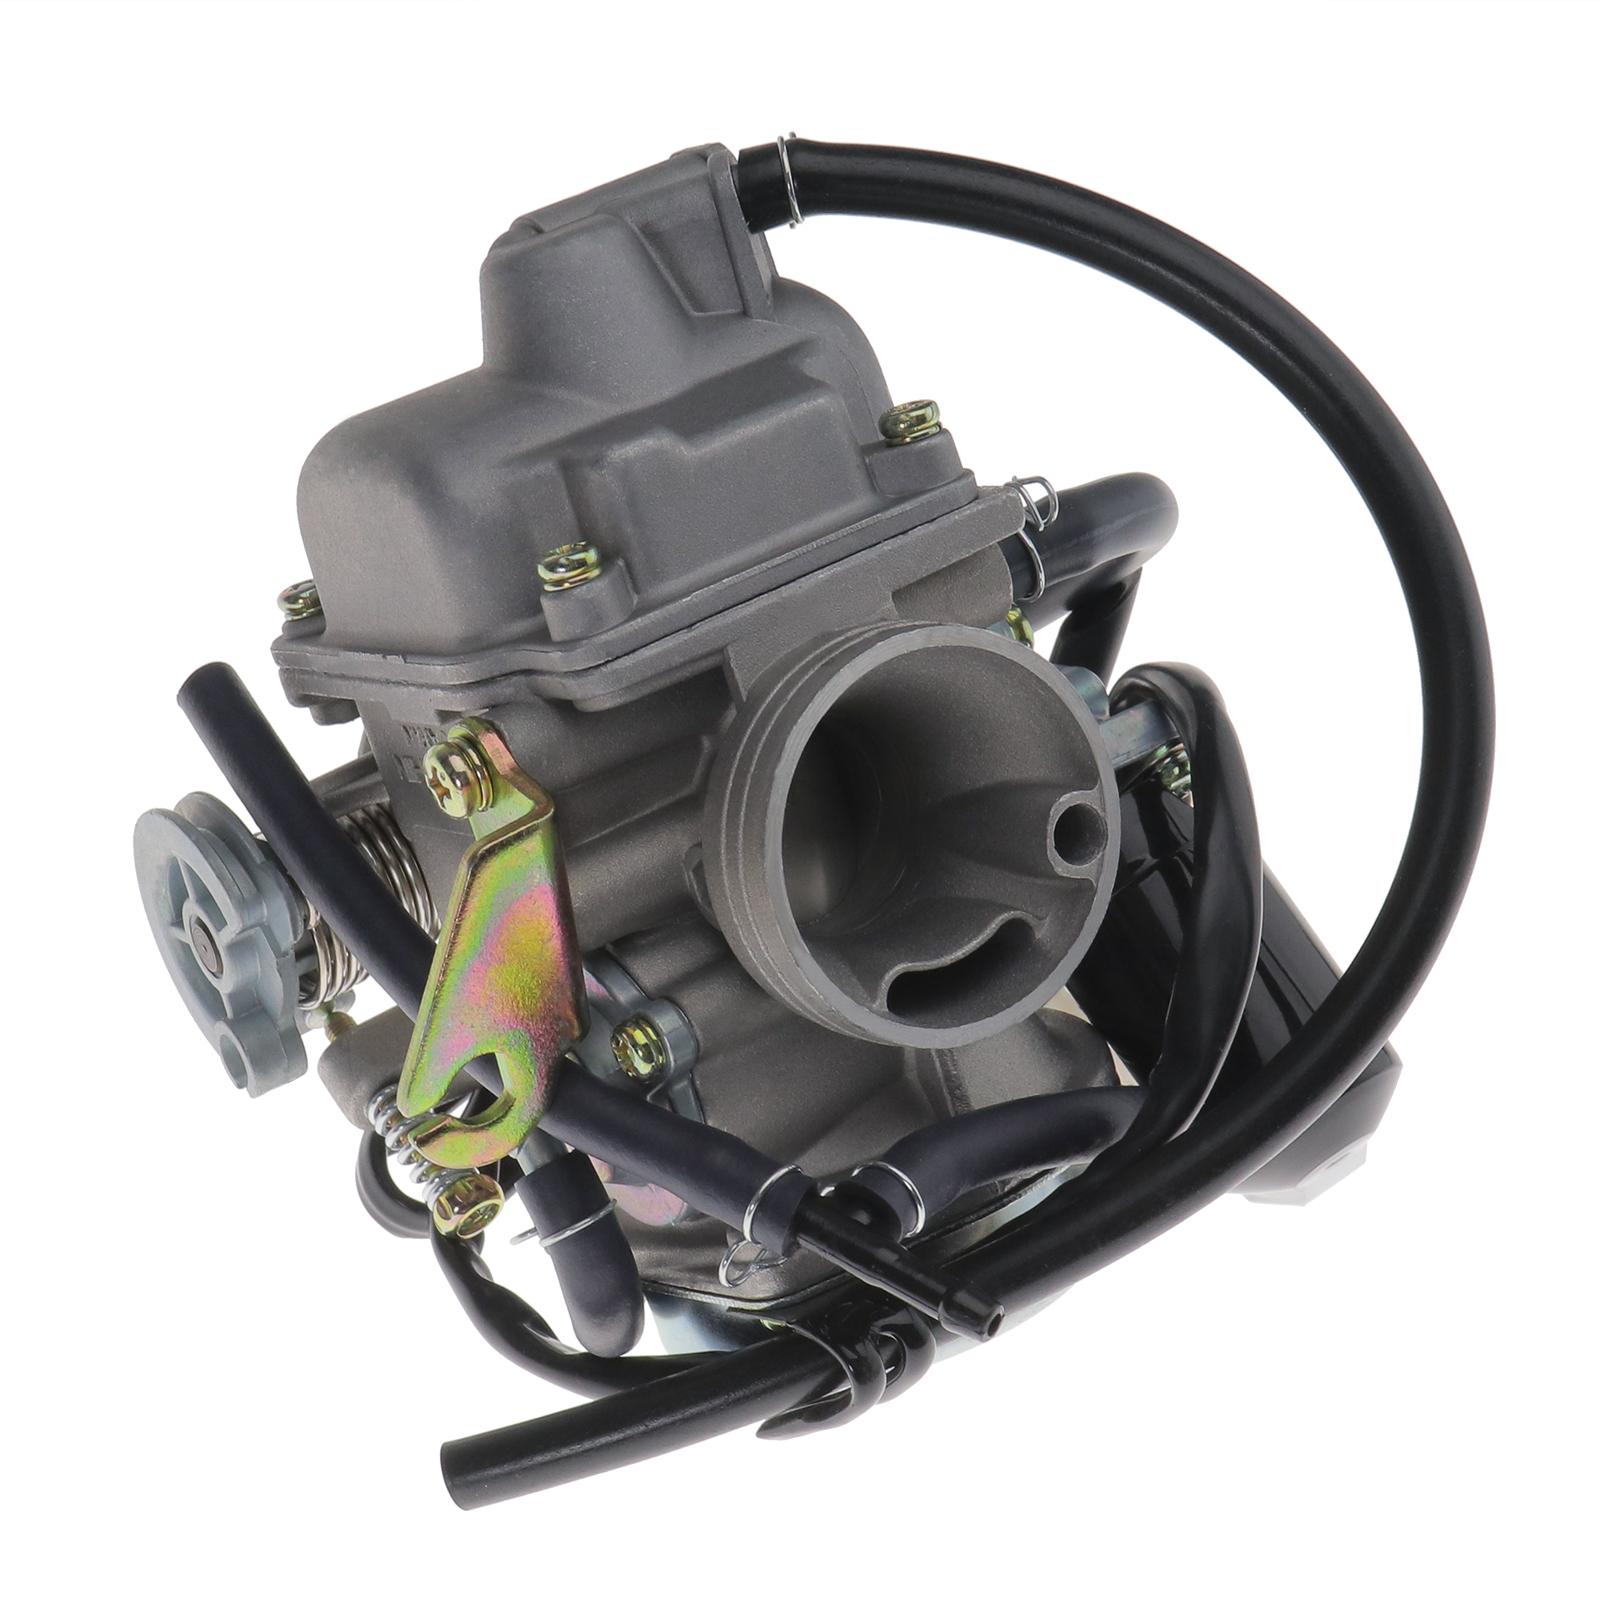 24mm GY6 110/125/150cc 4 Stroke Carburettor Carburetor ...